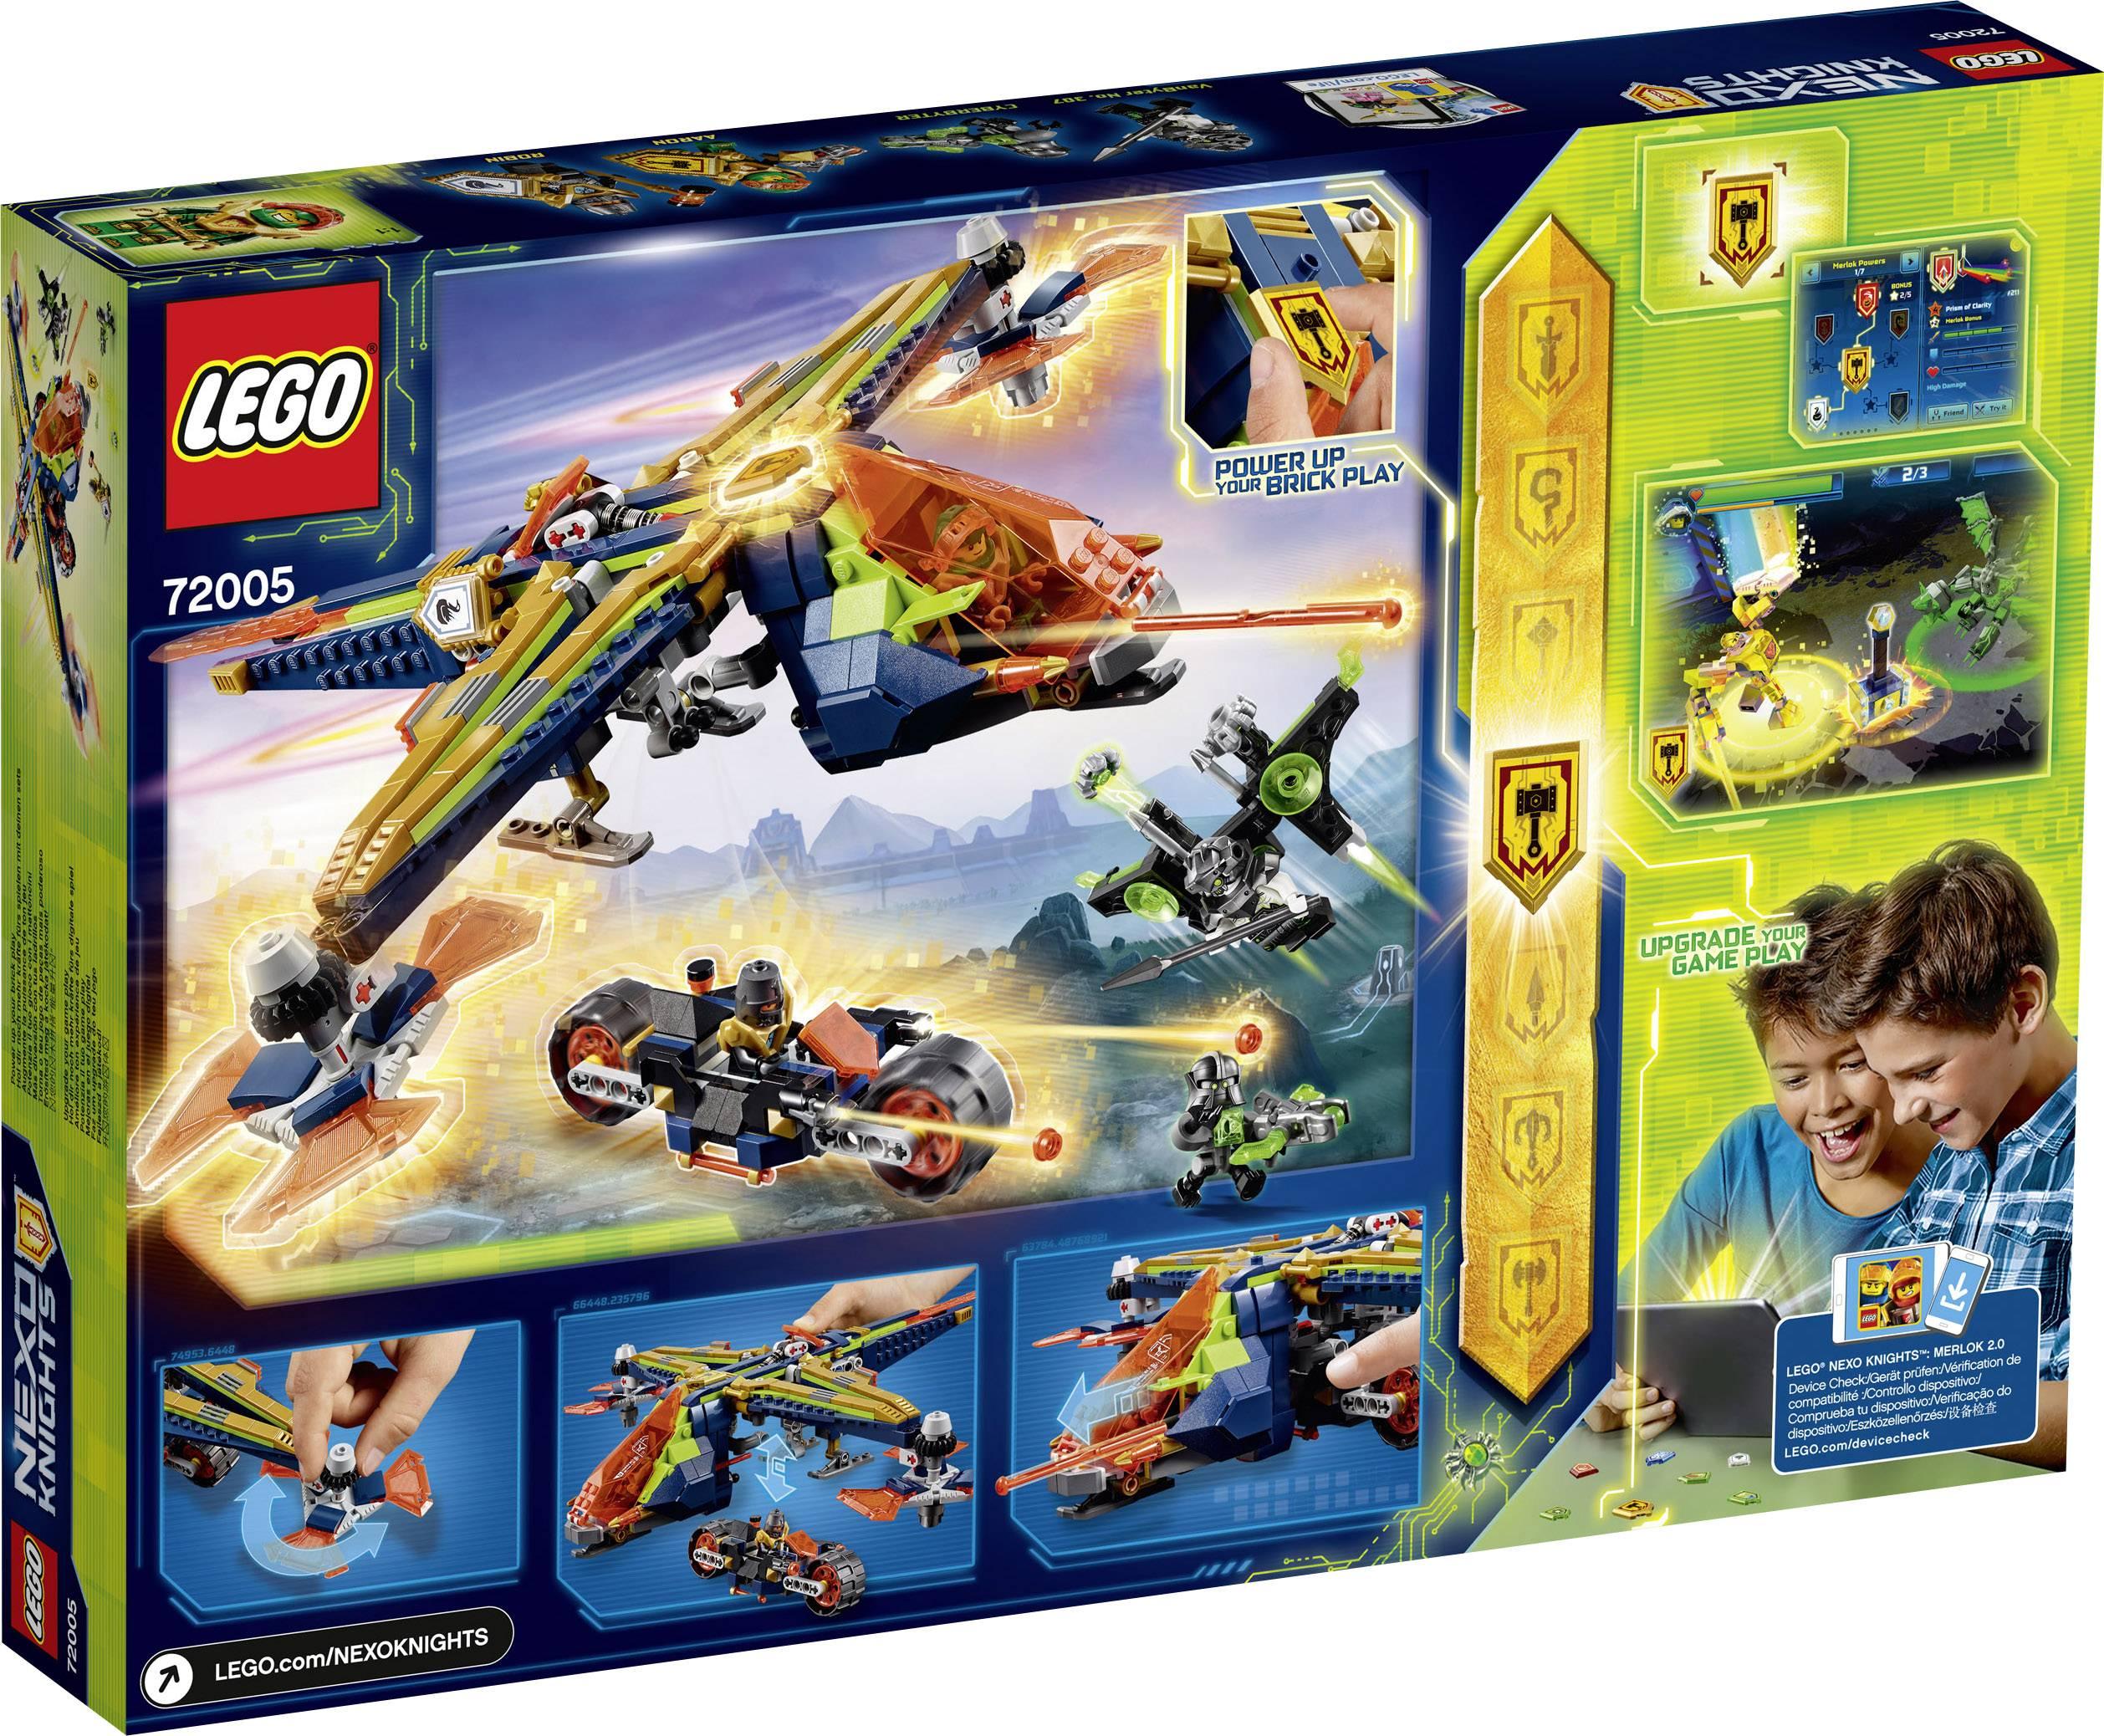 Lego Mini Figure Nexo Knights Aaron with Manic Pumpkin Power Shield 72005